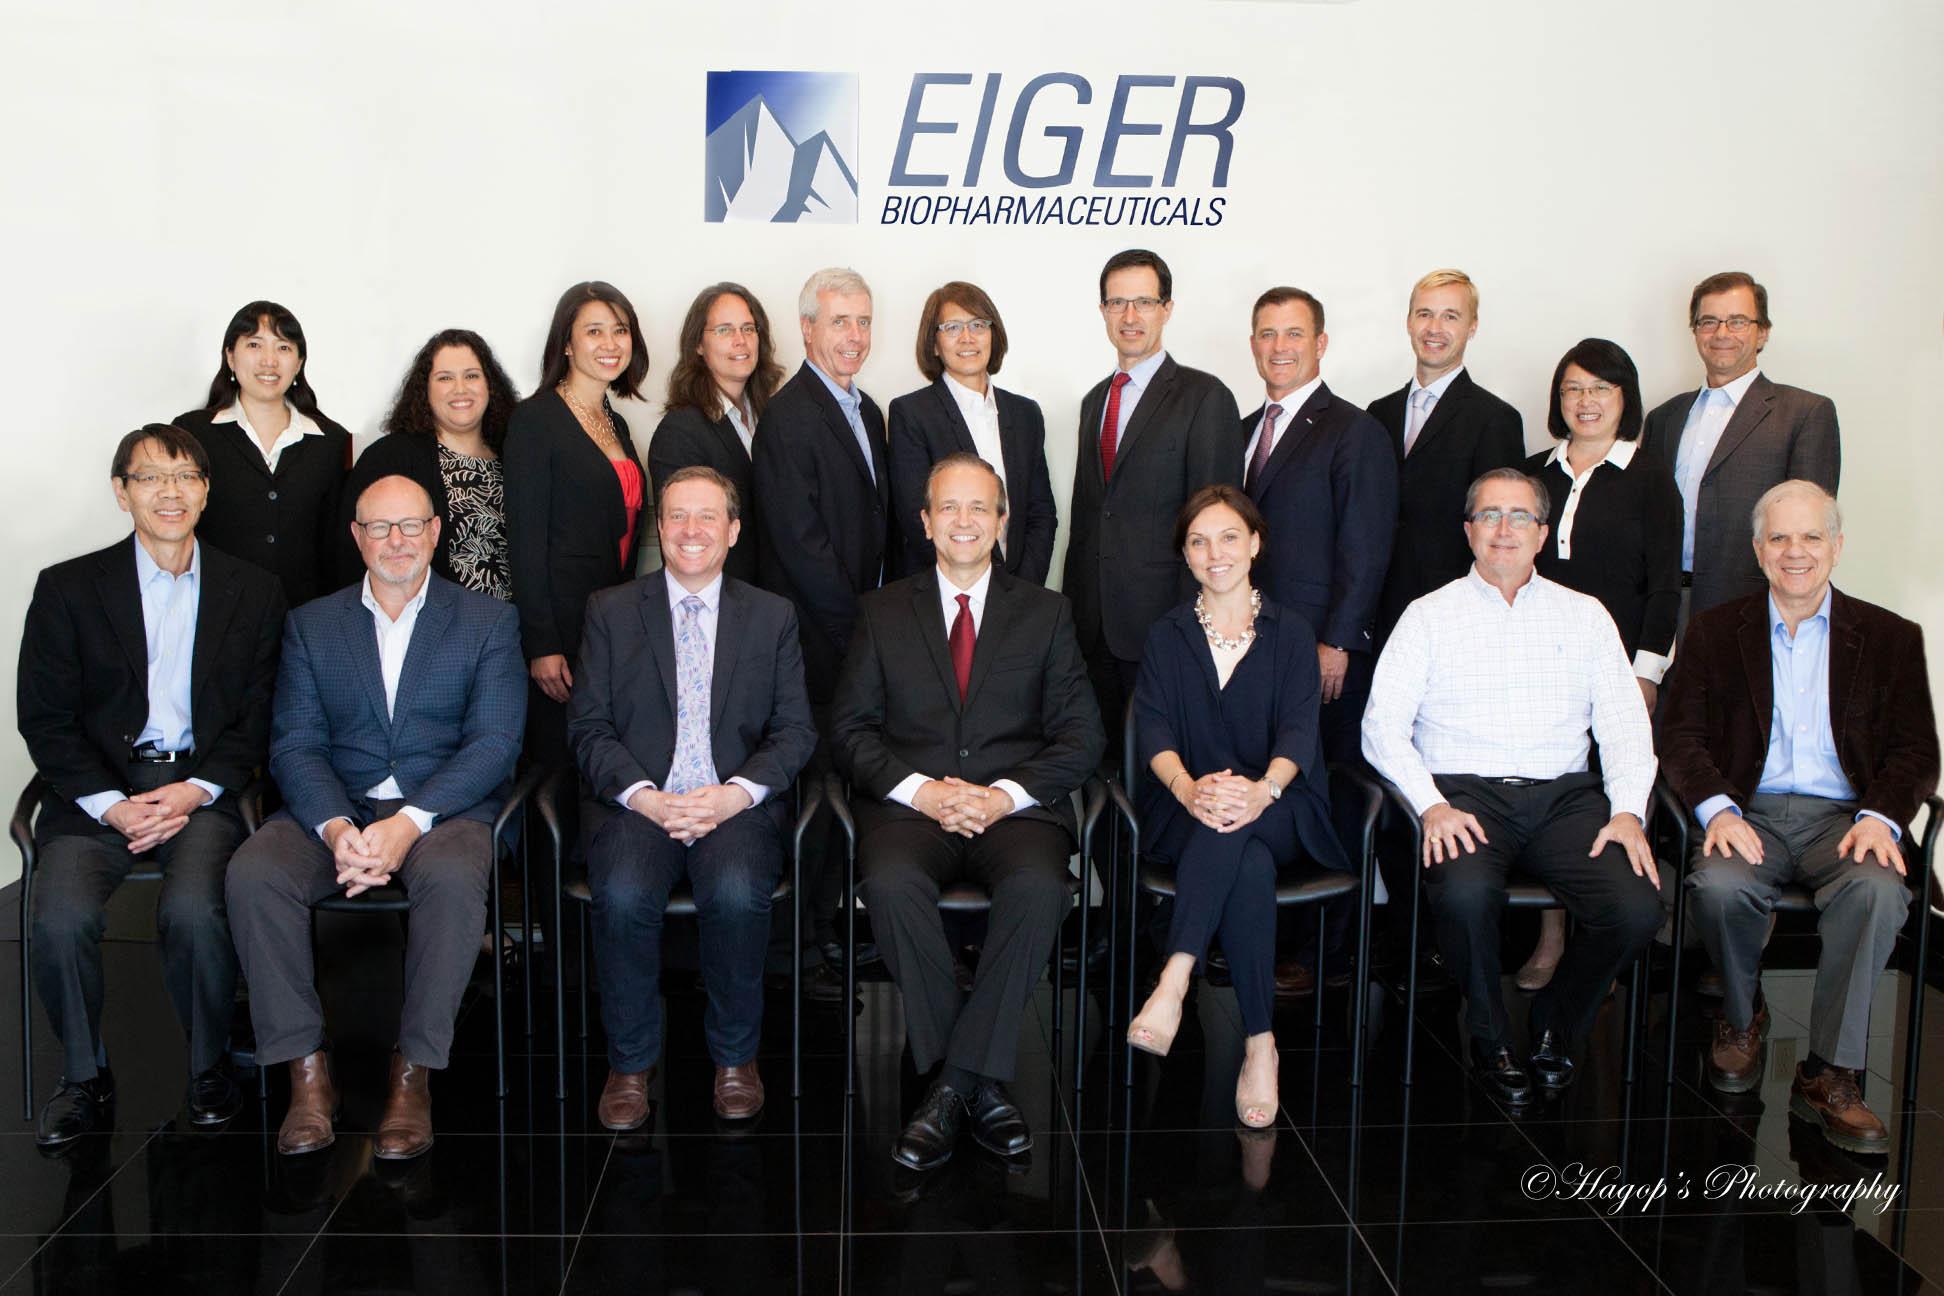 executive team photo at a startup